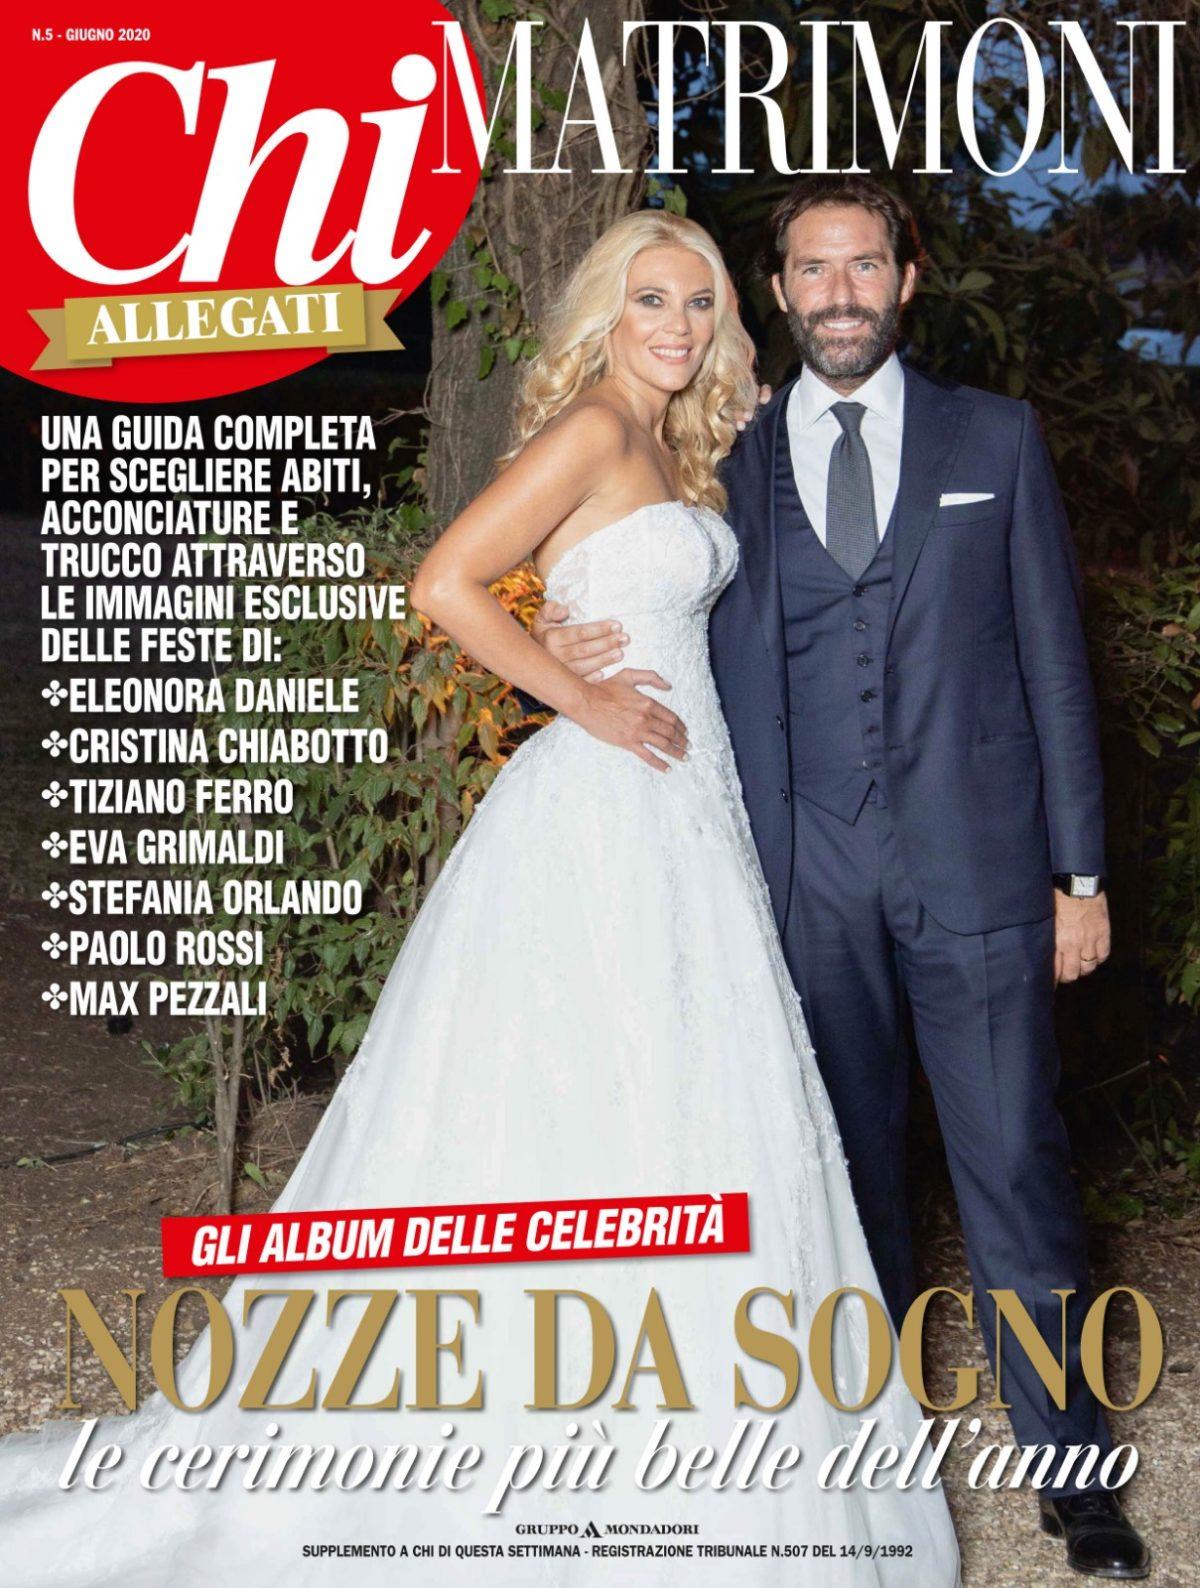 chi-matrimoni-cover